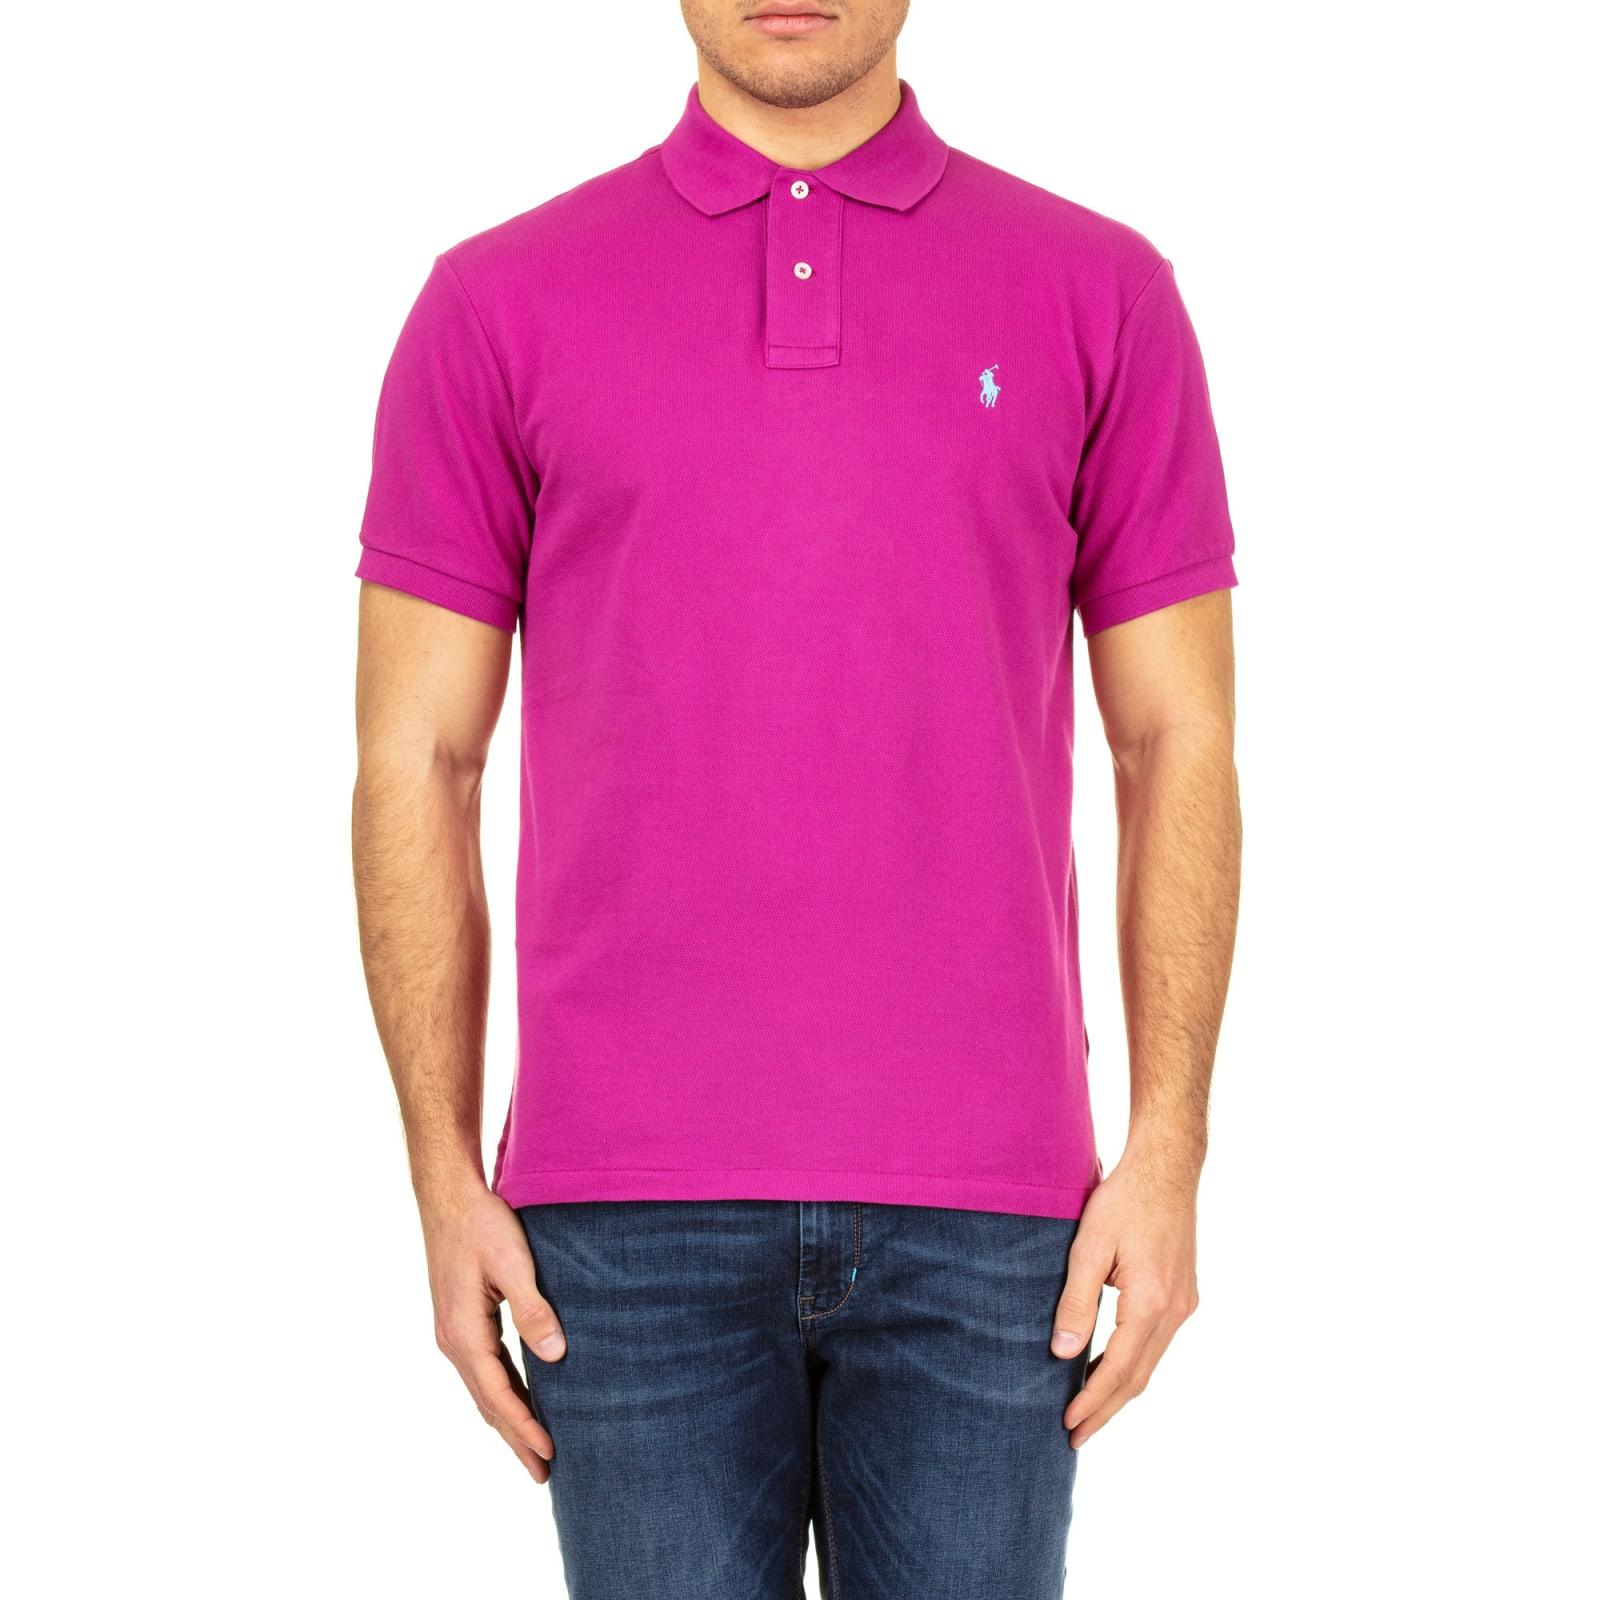 Cotton Piqué Shirt Polo Ralph Lauren Rj34A5qL